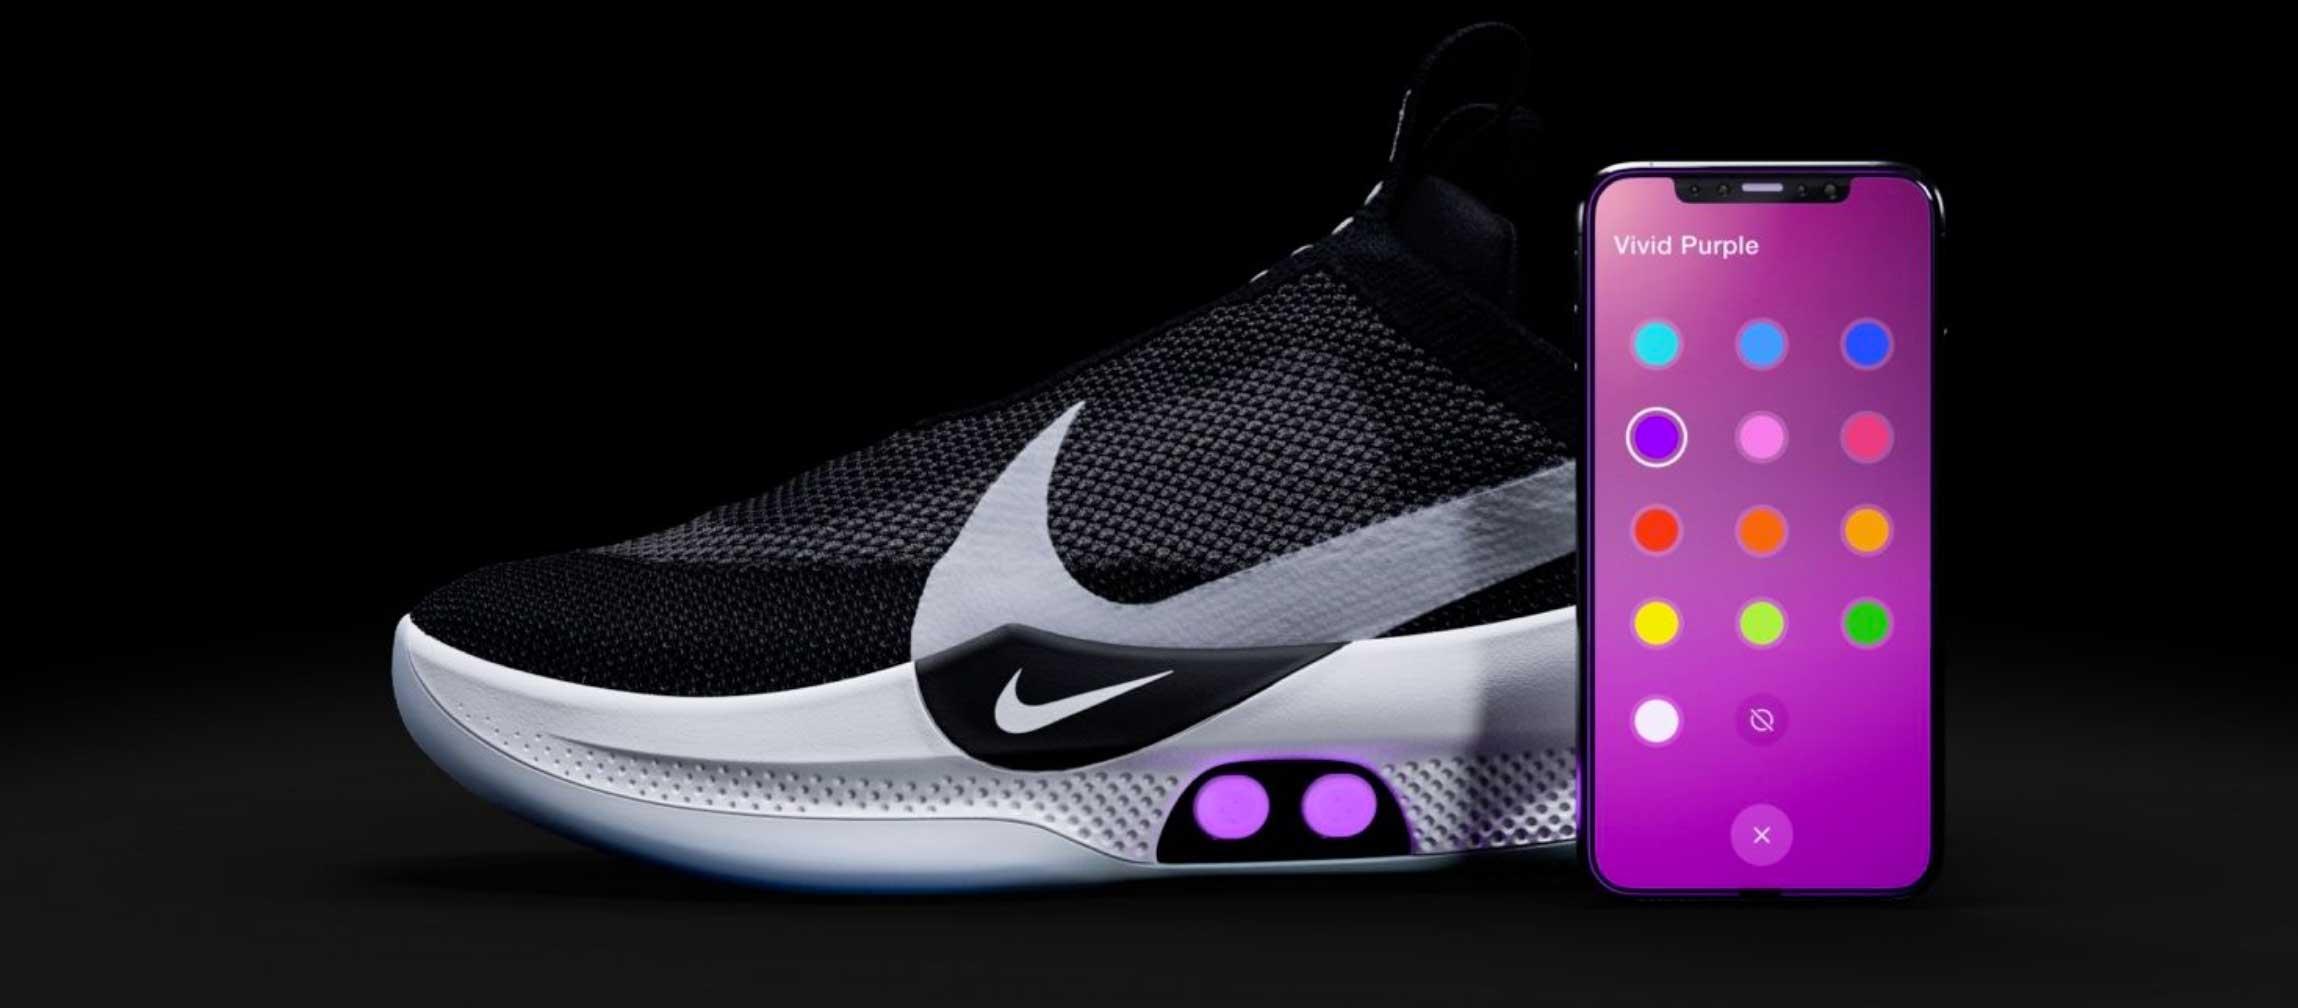 Scarpa Nike Autoregola L'allacciatura E Calzata Presenta La Smart Che kXN08nwOP